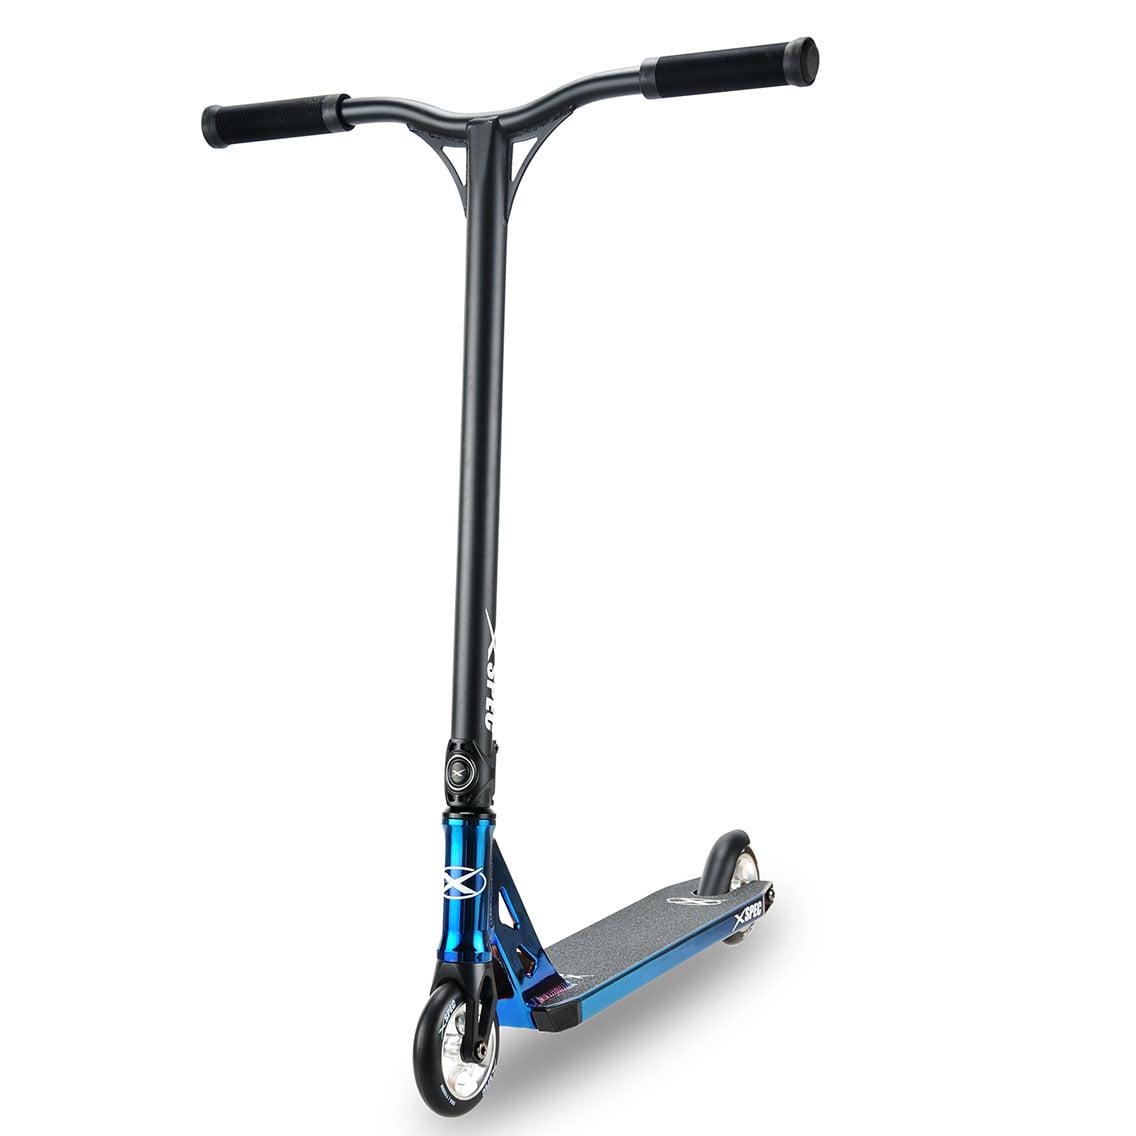 Xspec Blue Neo Chrome Pro Stunt Kick Scooter Anodized Aluminum BMX Handlebar by Xspec